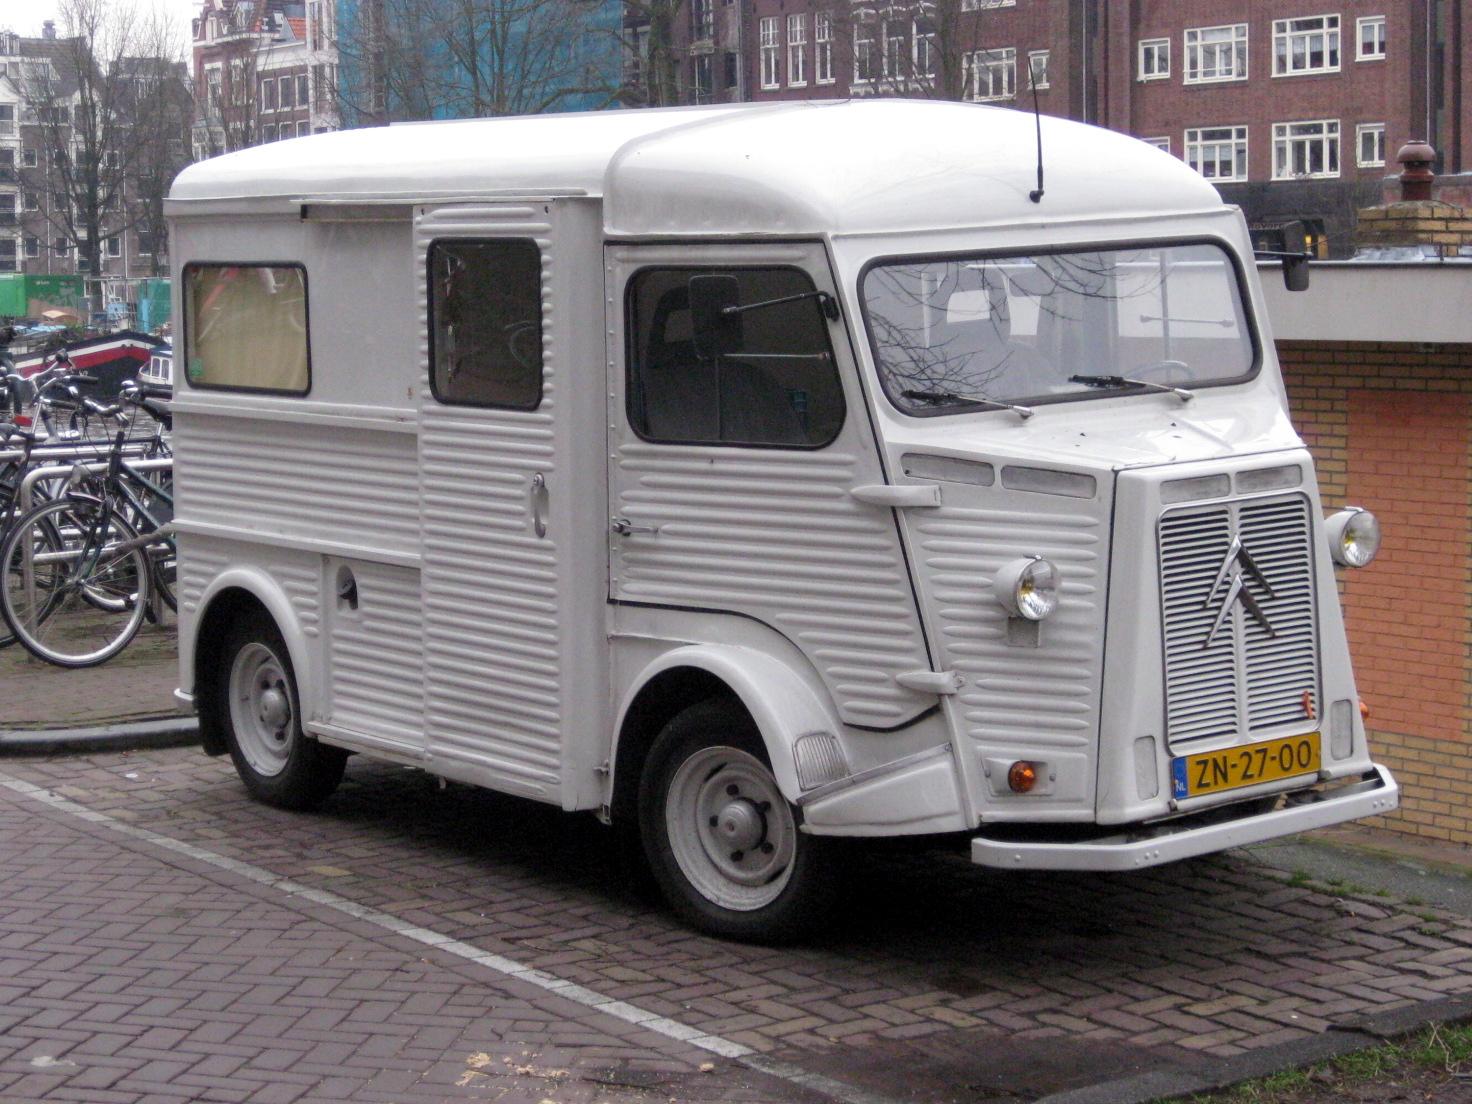 Rouen Amsterdam En Camping Car